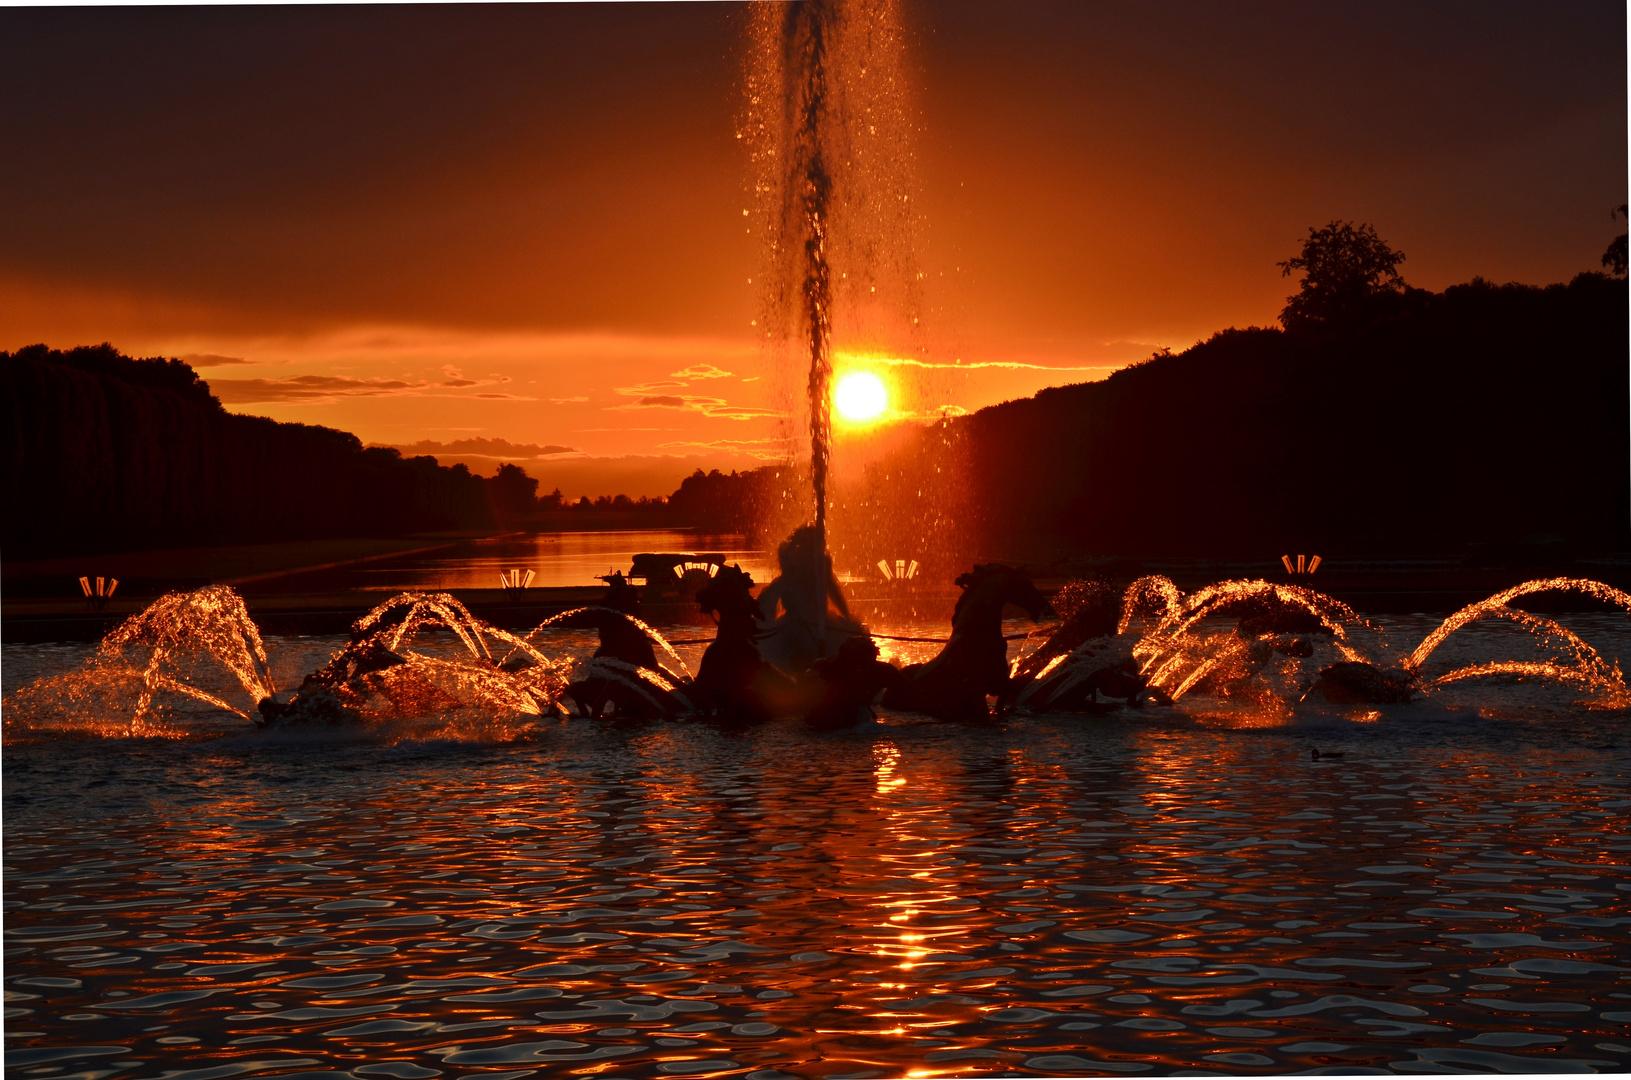 Ludwigs Sonnenuntergang